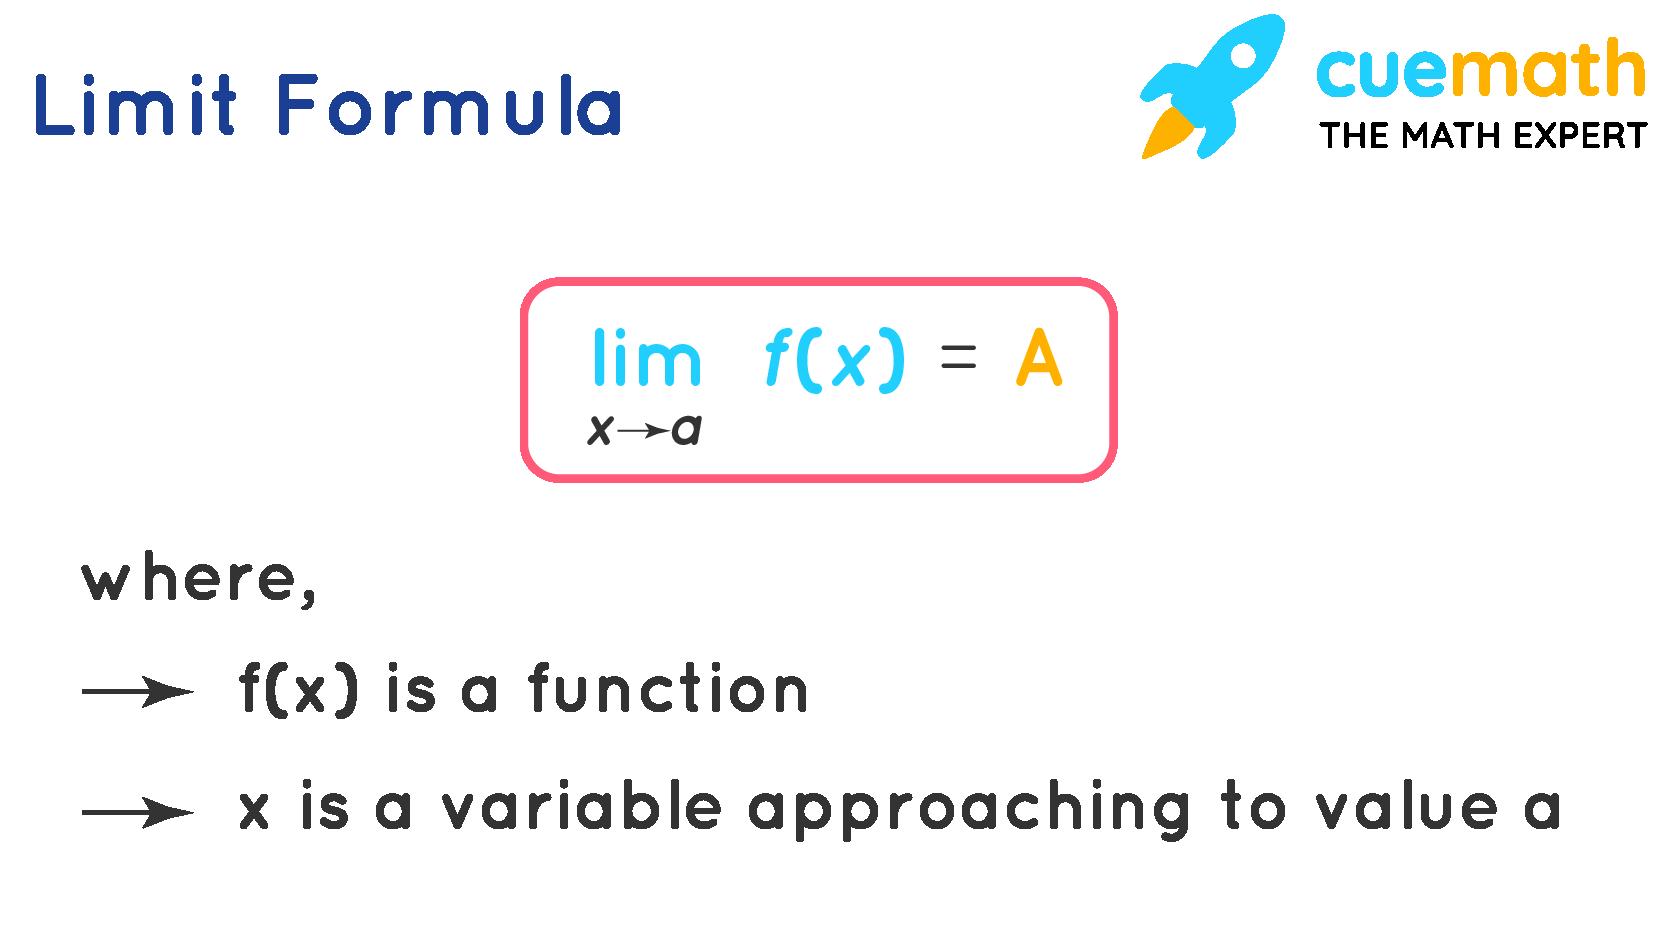 Limit Formula